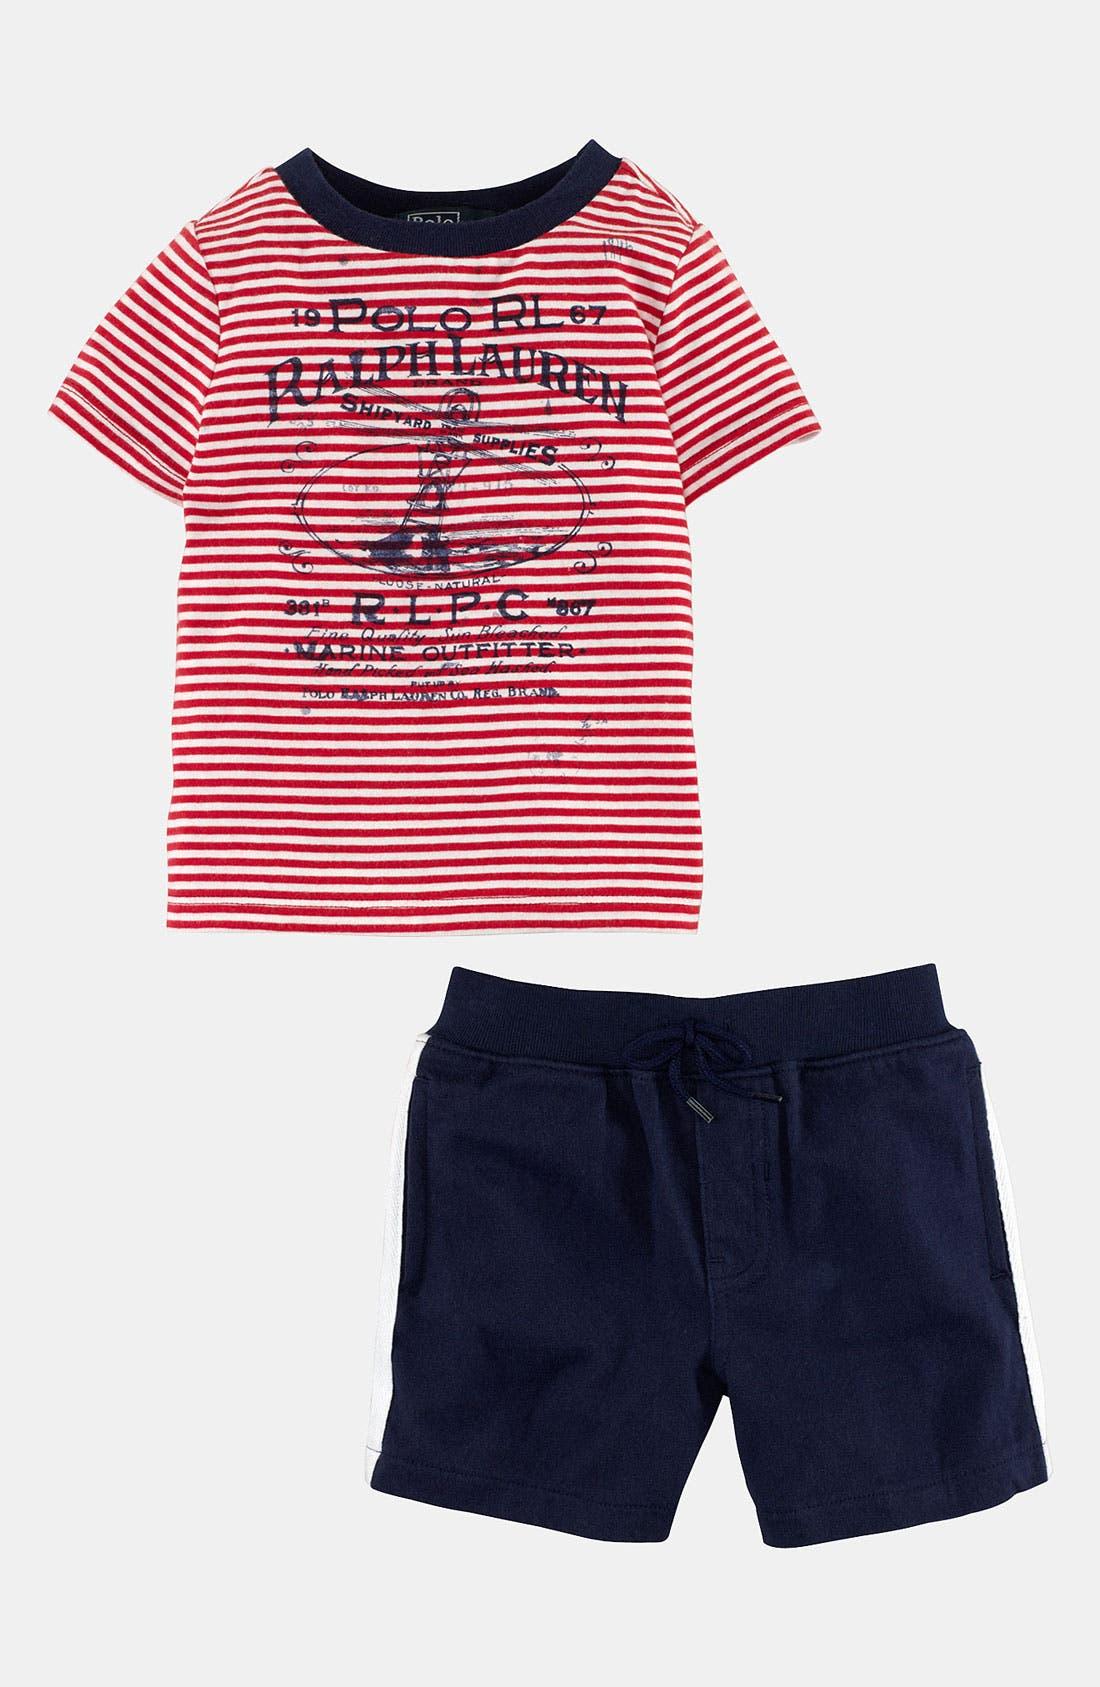 Alternate Image 1 Selected - Ralph Lauren T-Shirt & Shorts (Baby)